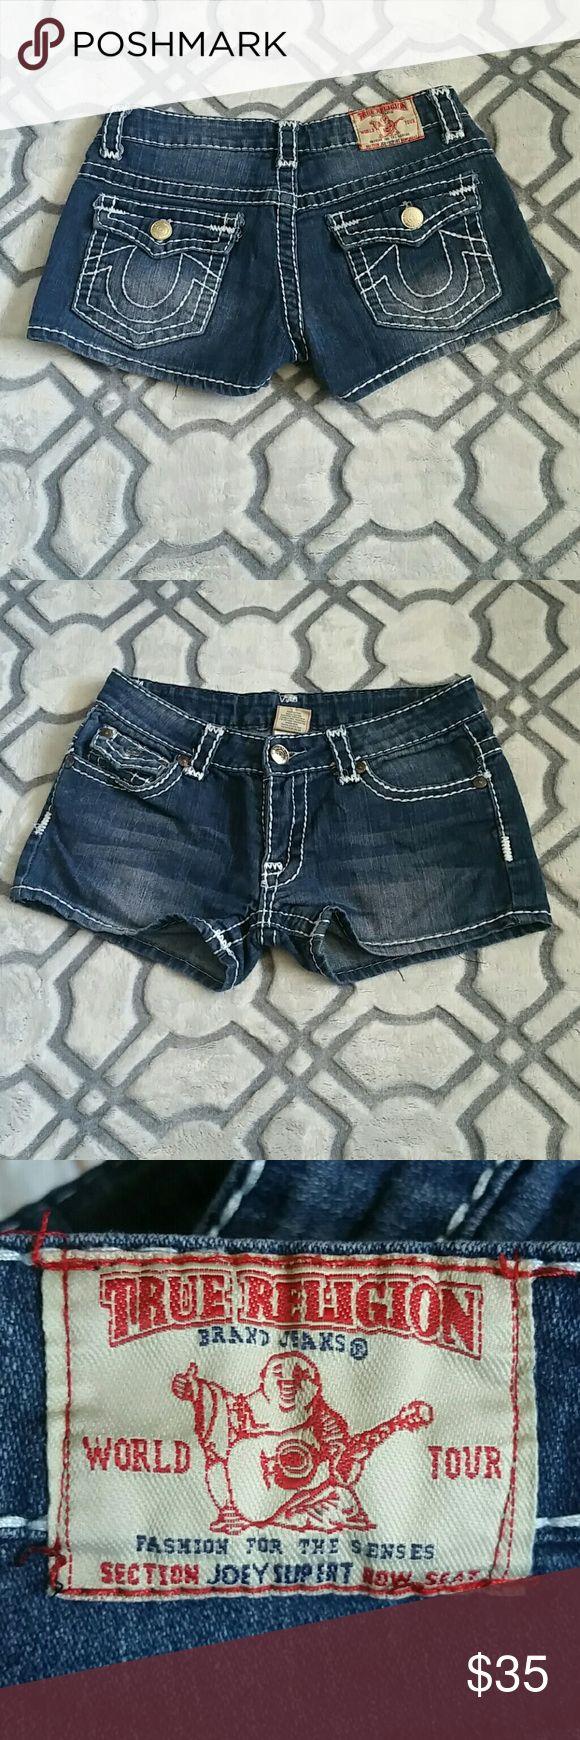 True Religion Shorts Denim True Religion Shorts Jean Shorts